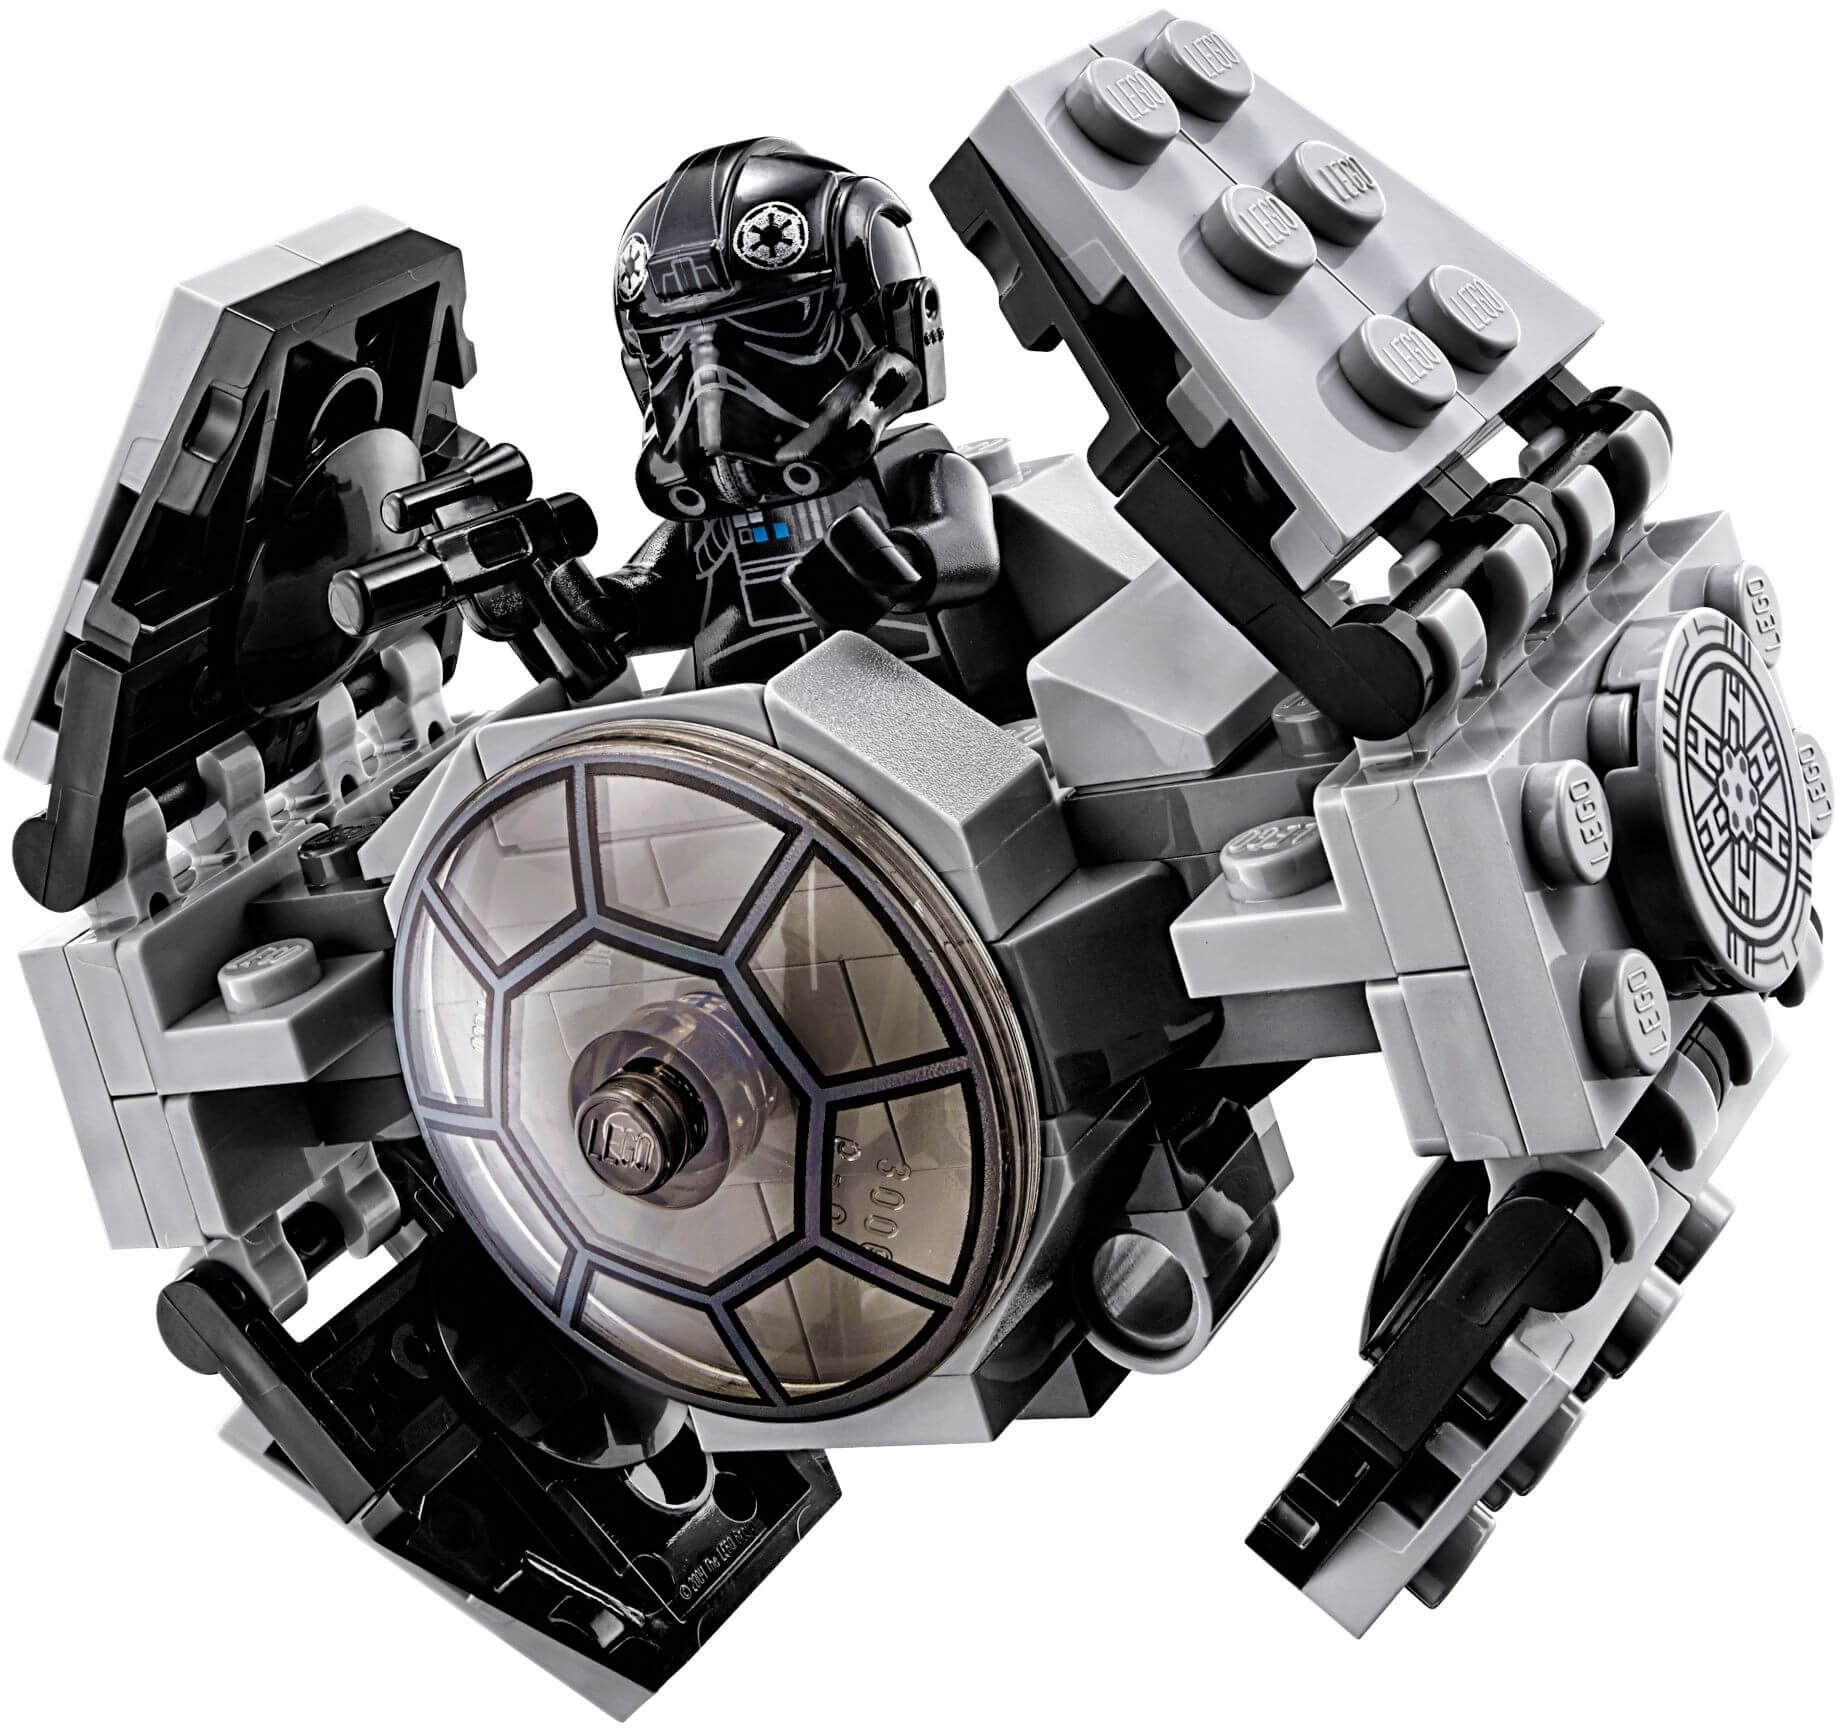 Mua đồ chơi LEGO 75128 - LEGO Star Wars 75128 - Mẫu TIE đời mới thu nhỏ (LEGO Star Wars TIE Advanced Prototype 75128)